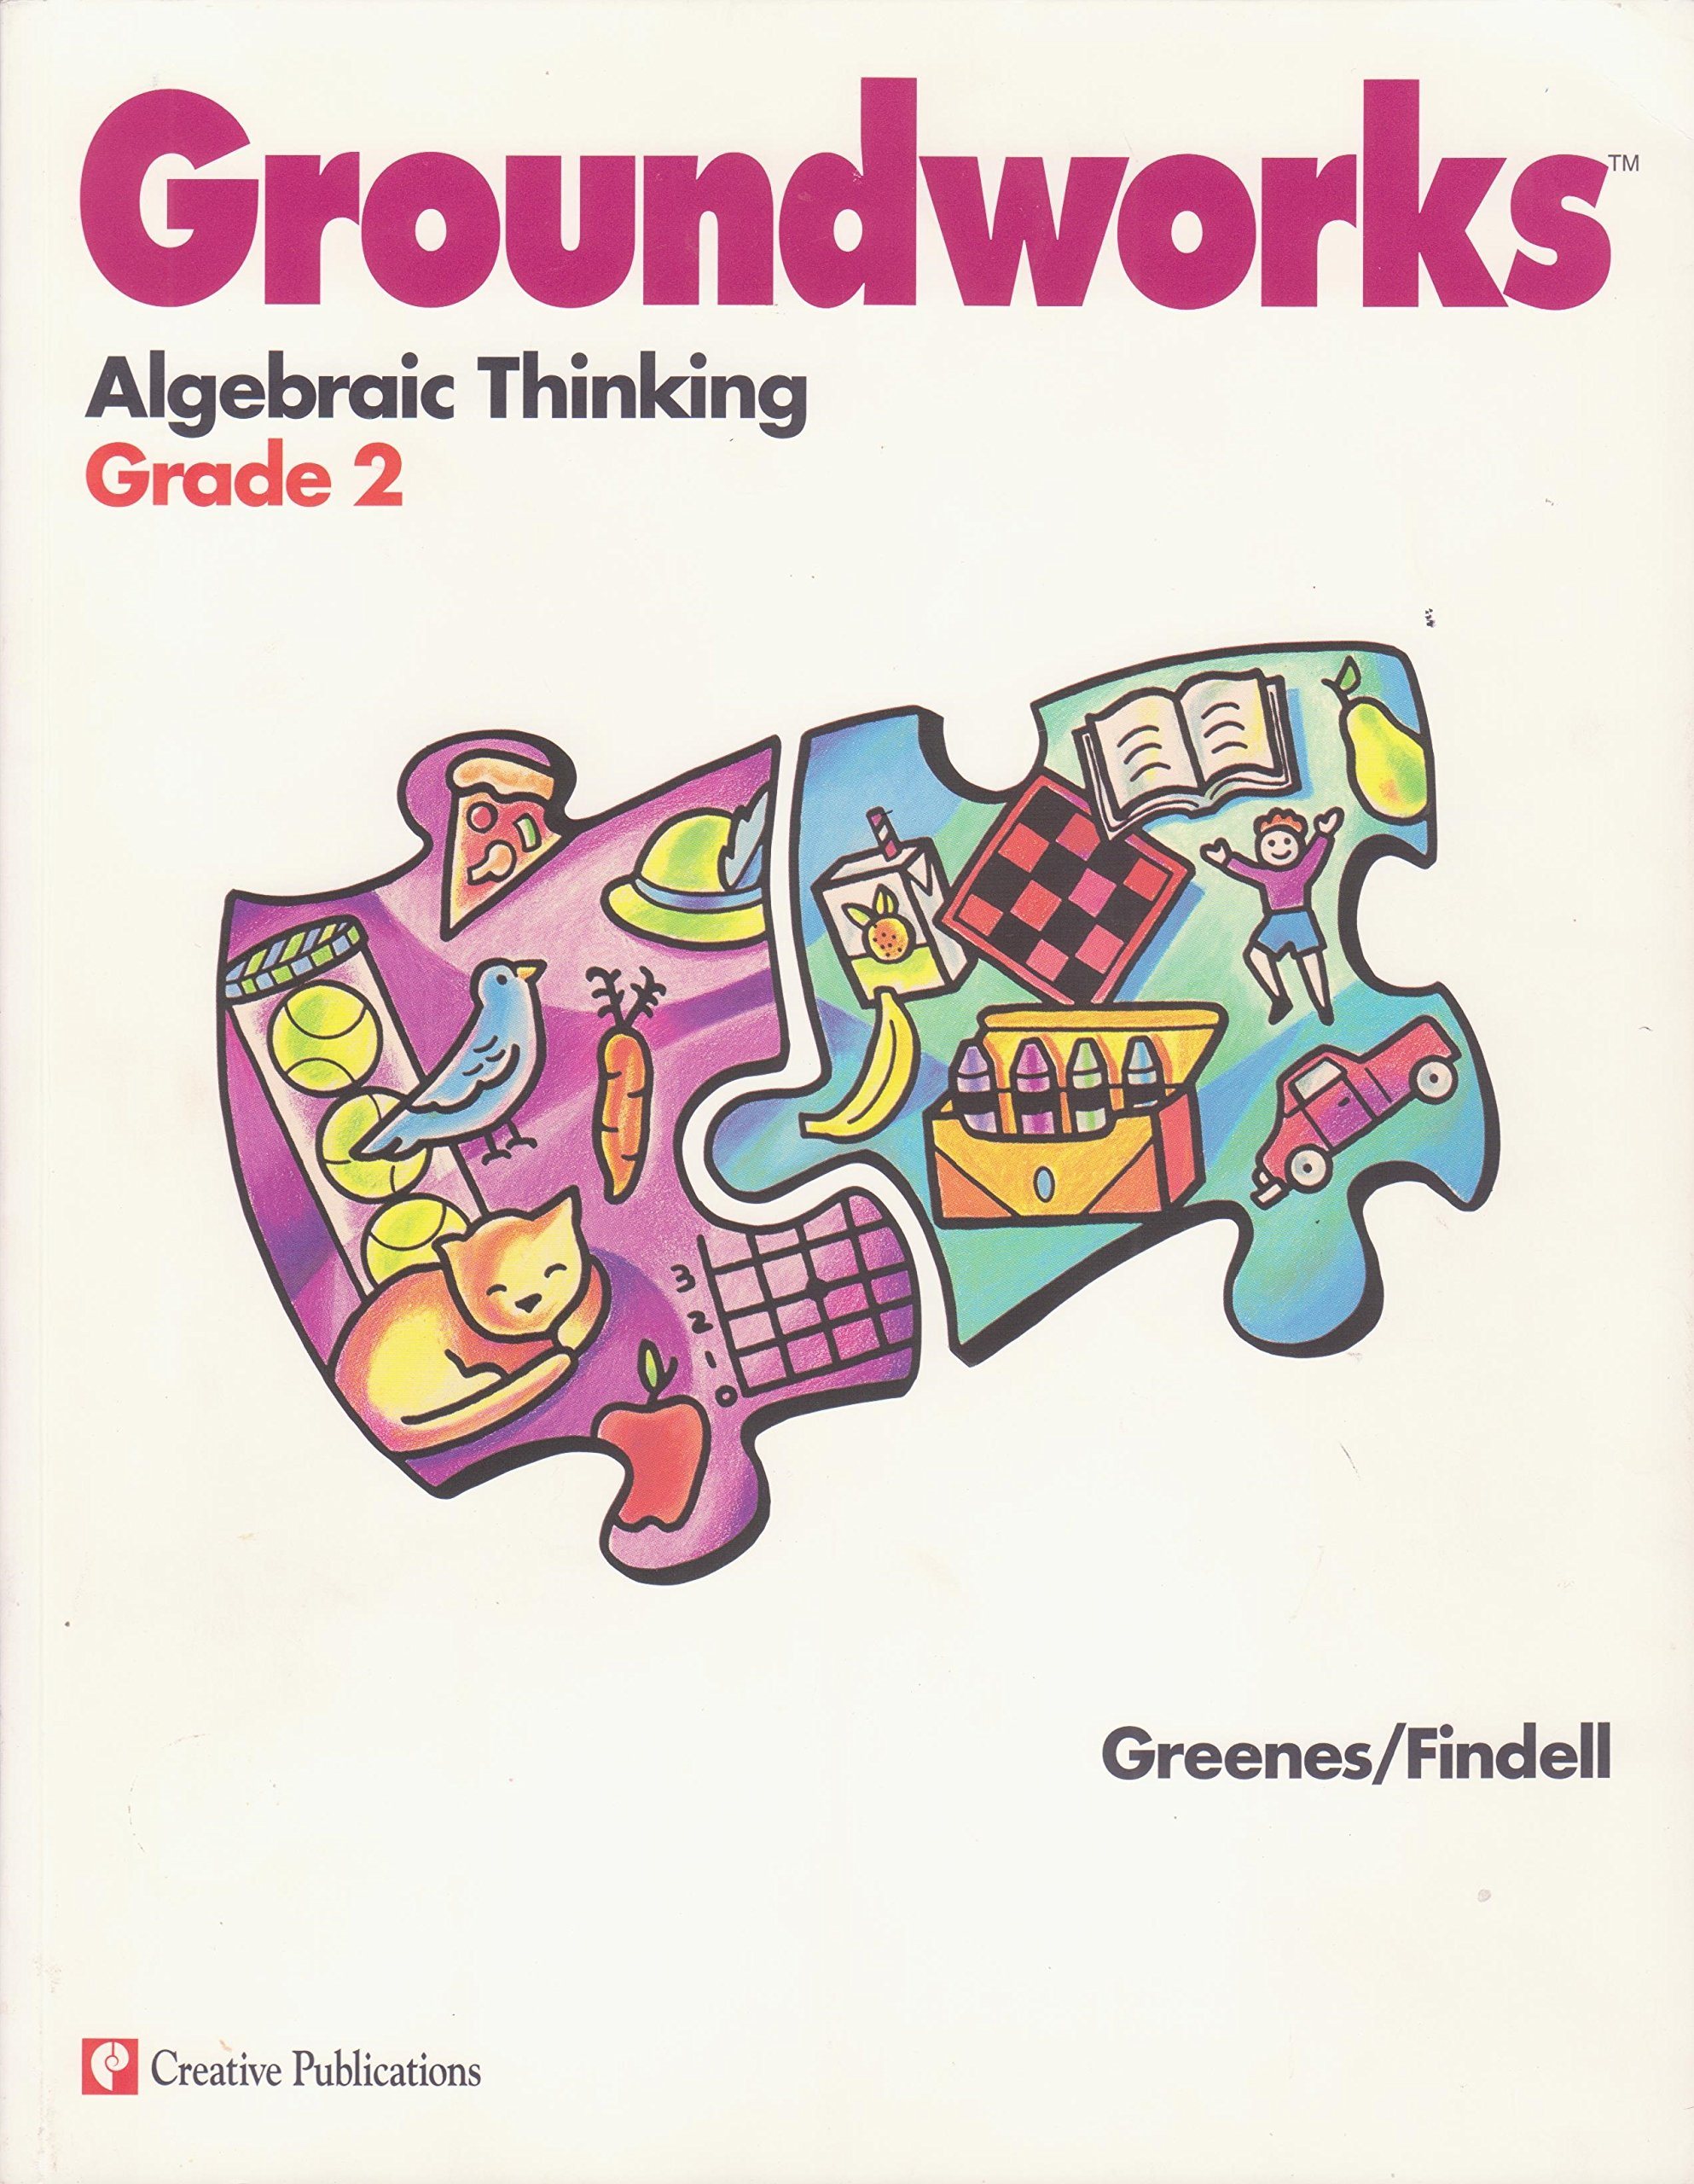 Groundworks Algebraic Thinking (grade 2) pdf